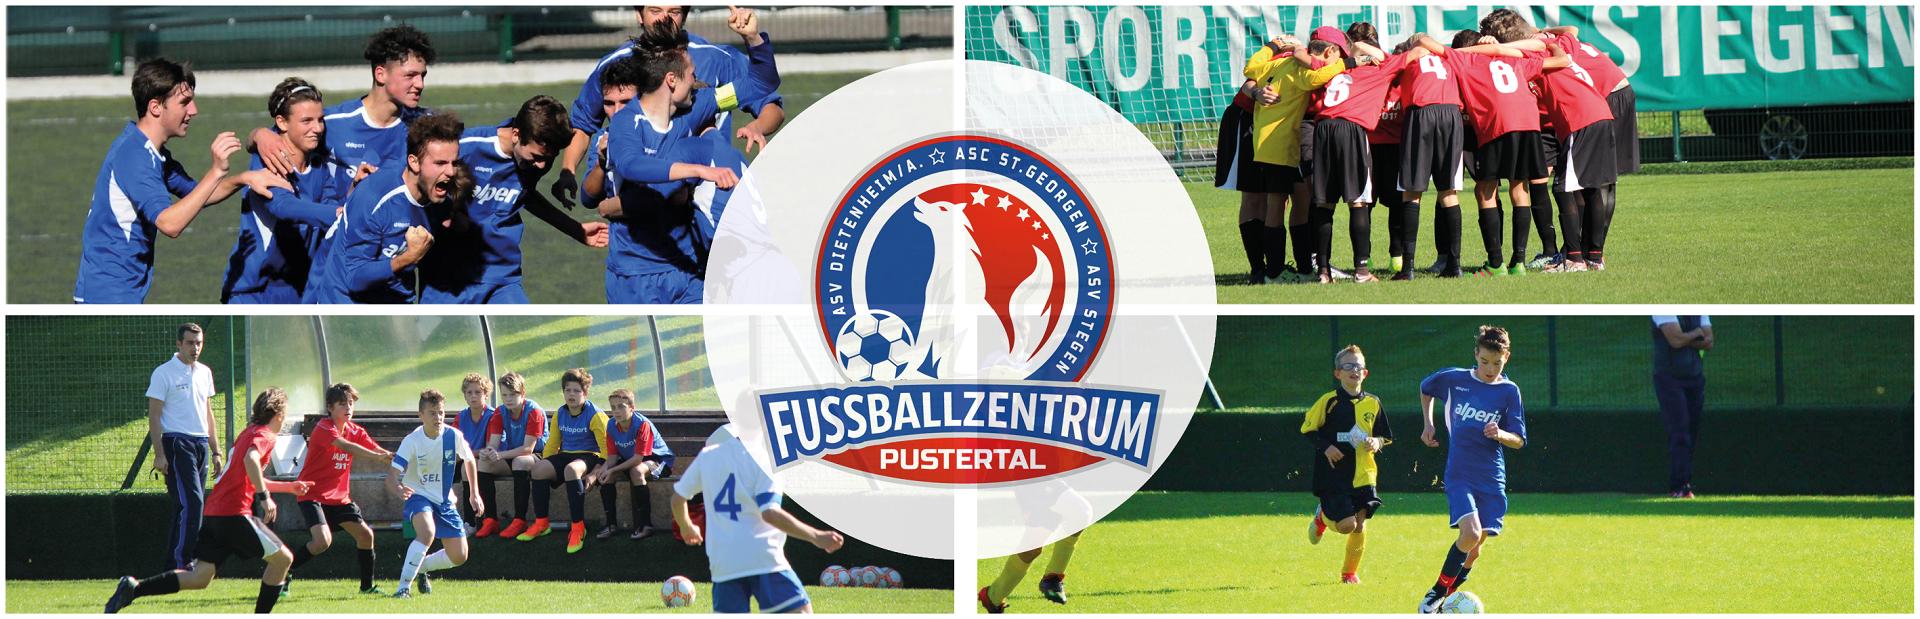 fussballzentrum-pustertal-nuovo